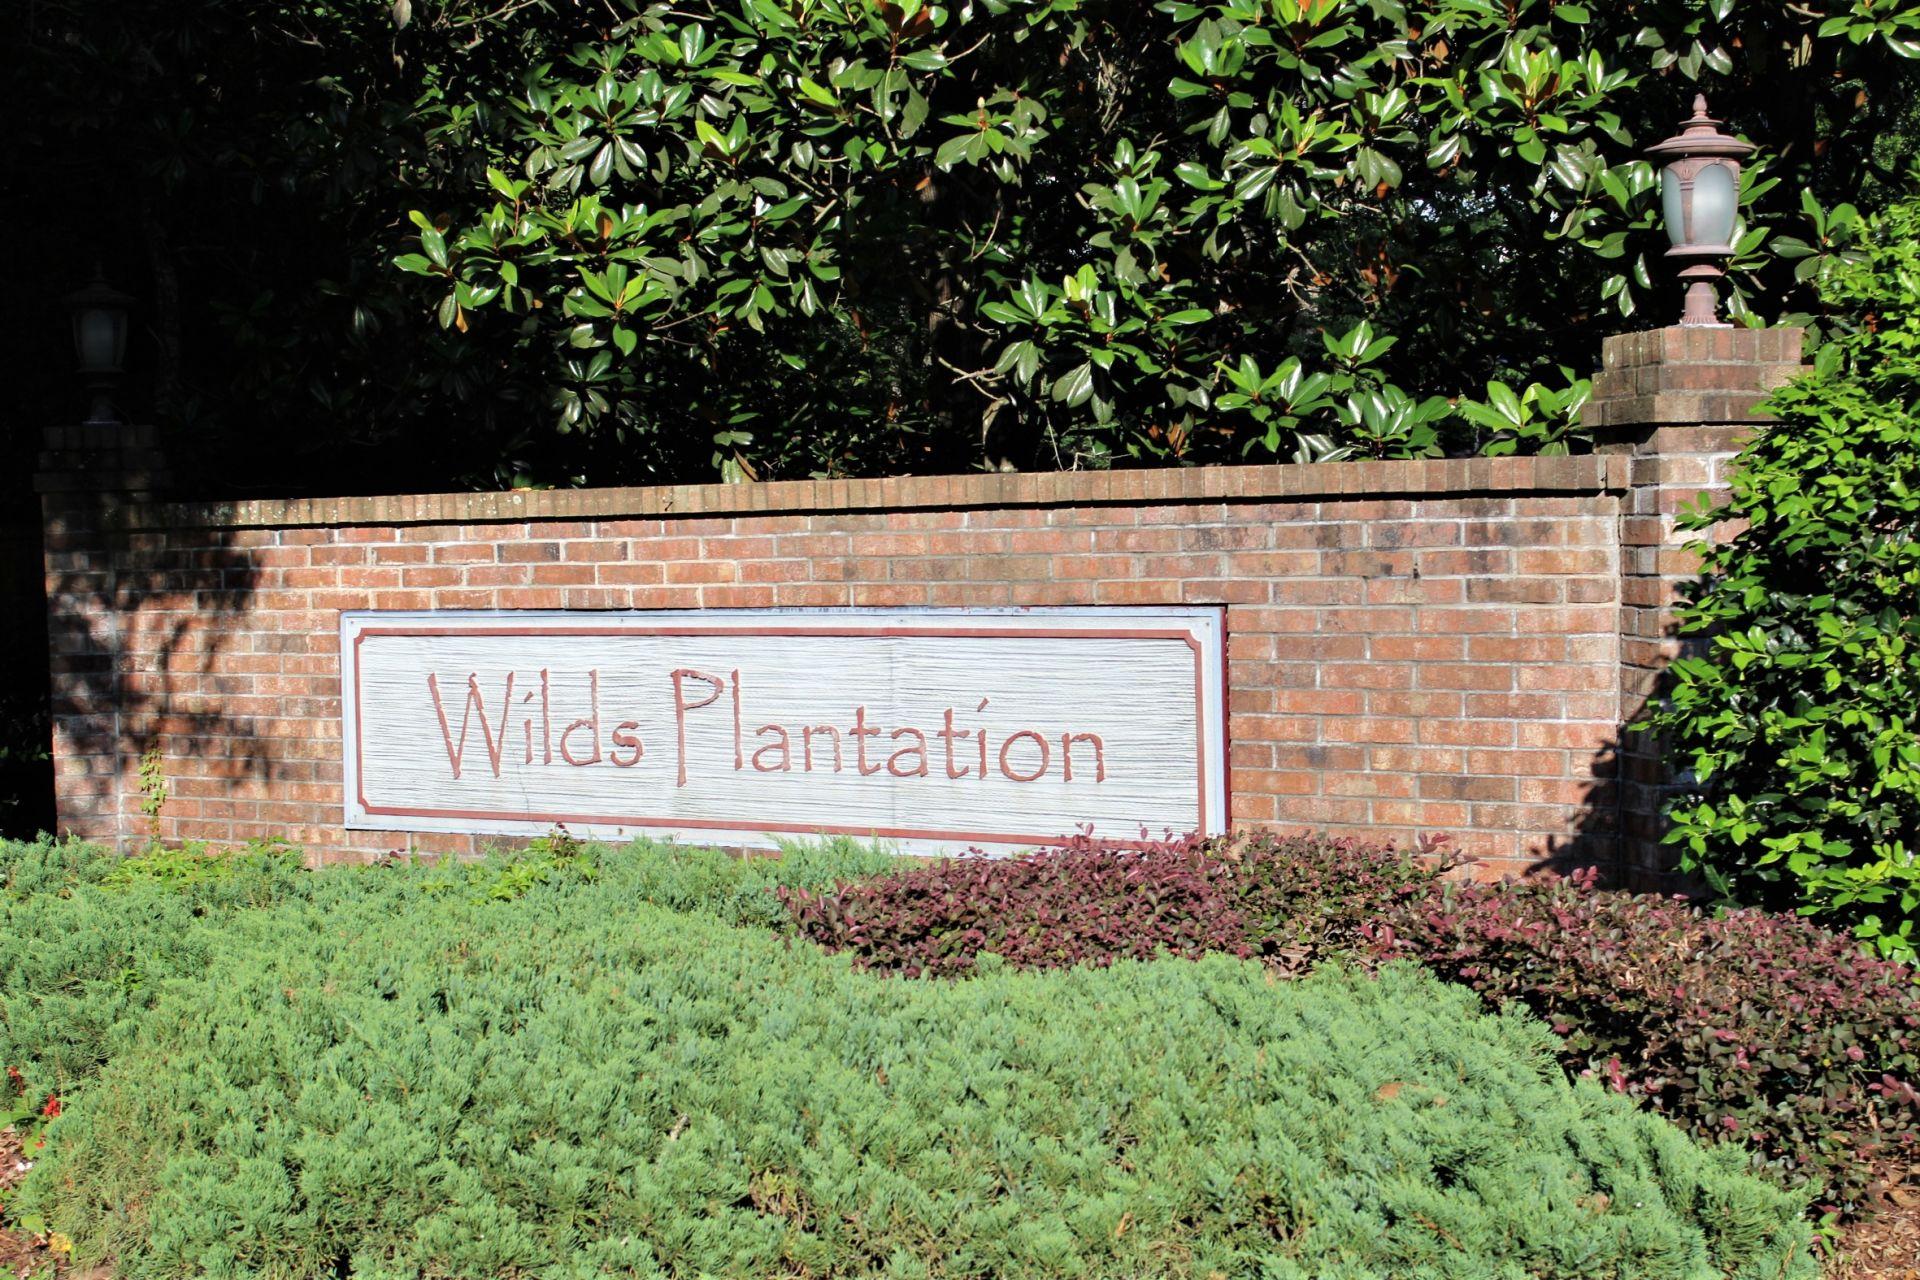 Wilds Plantation